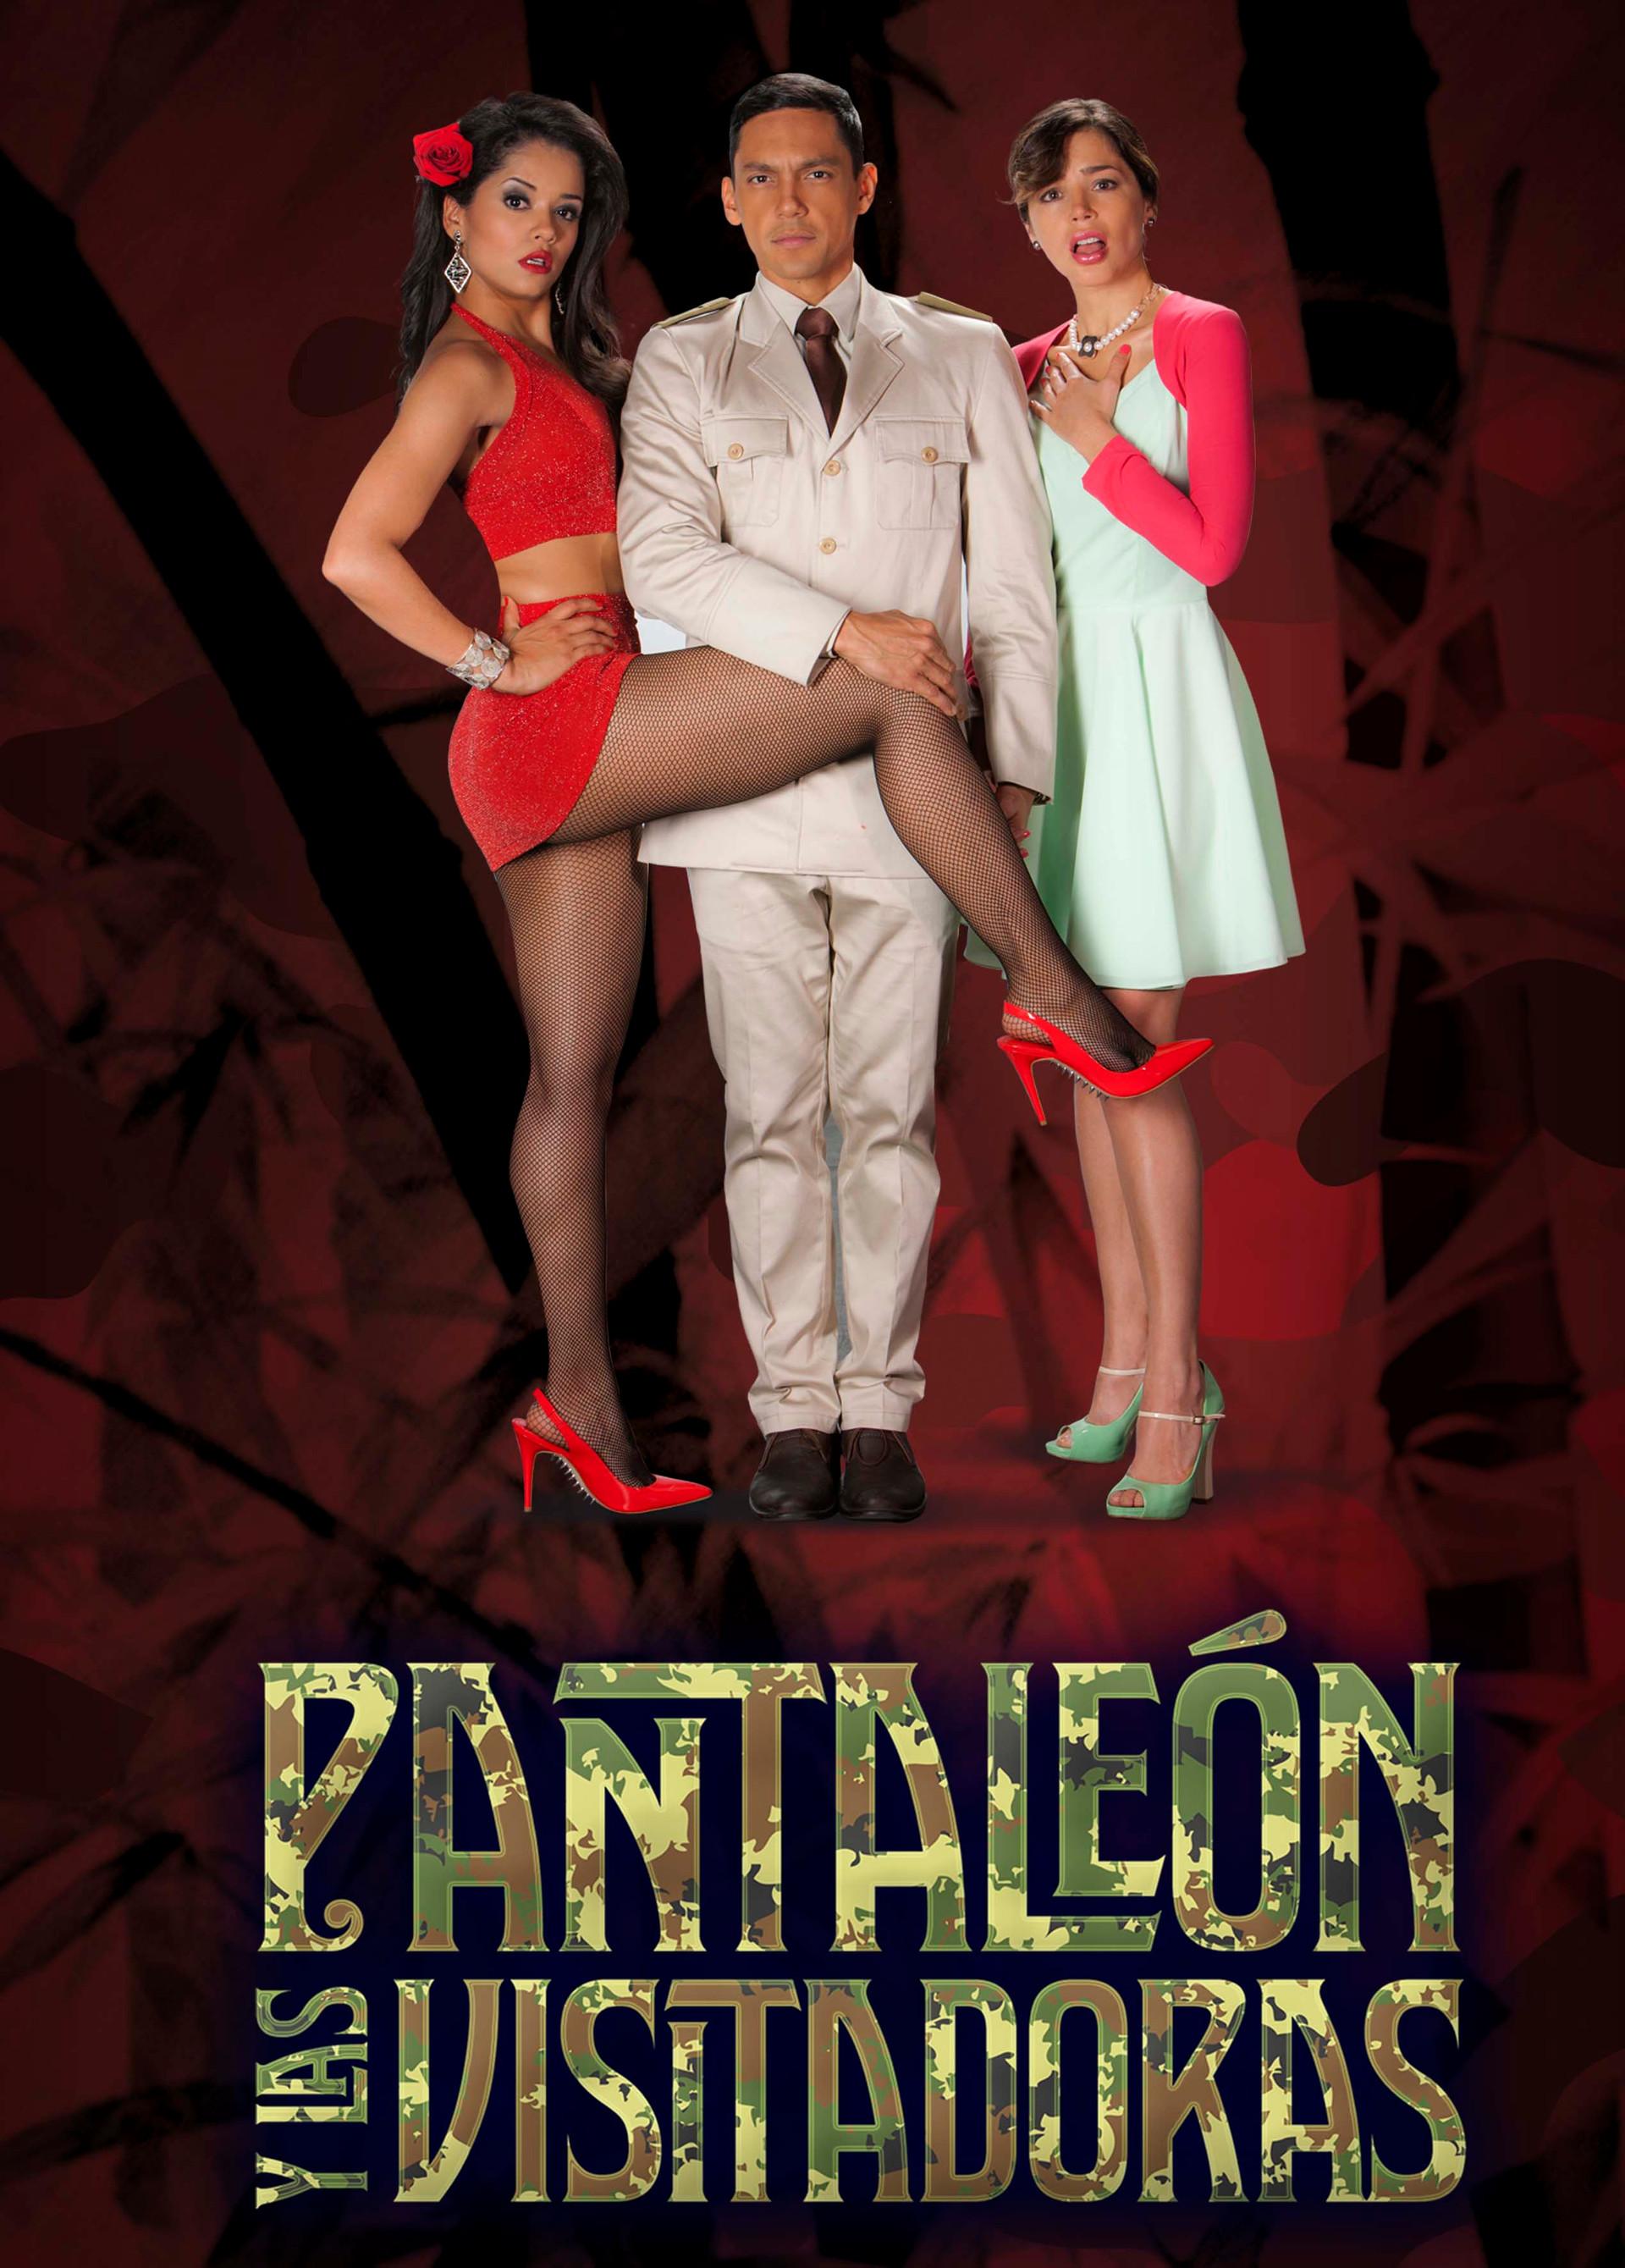 pantaleon cartel.jpg